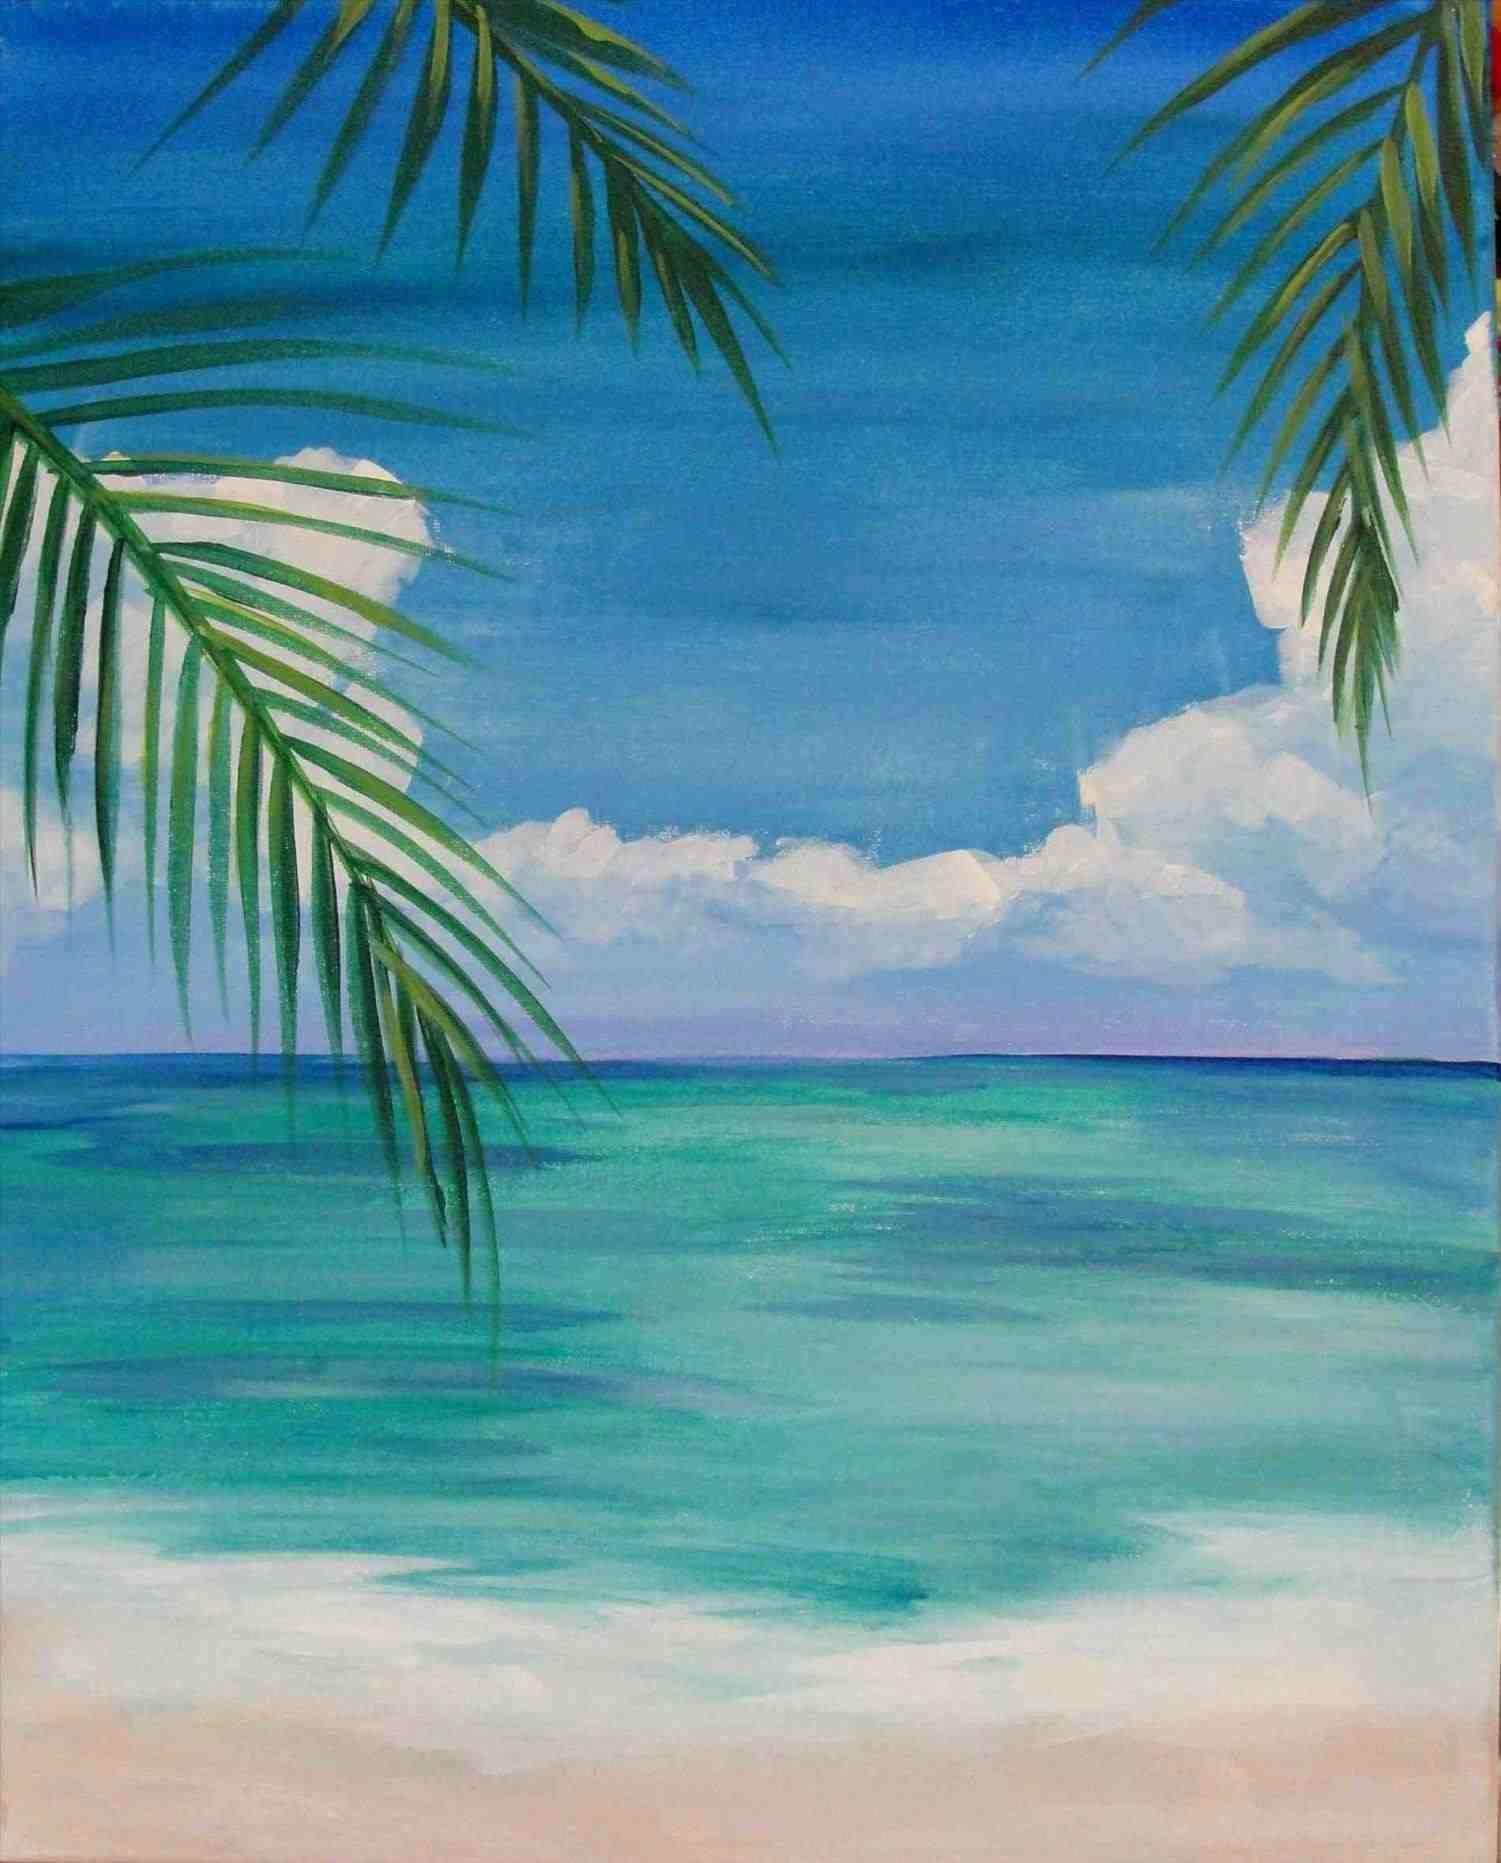 Oil Painting Paper Usedoilpaintings Oilpaintingeasy Beach Art Painting Watercolor Paintings For Beginners Easy Canvas Art